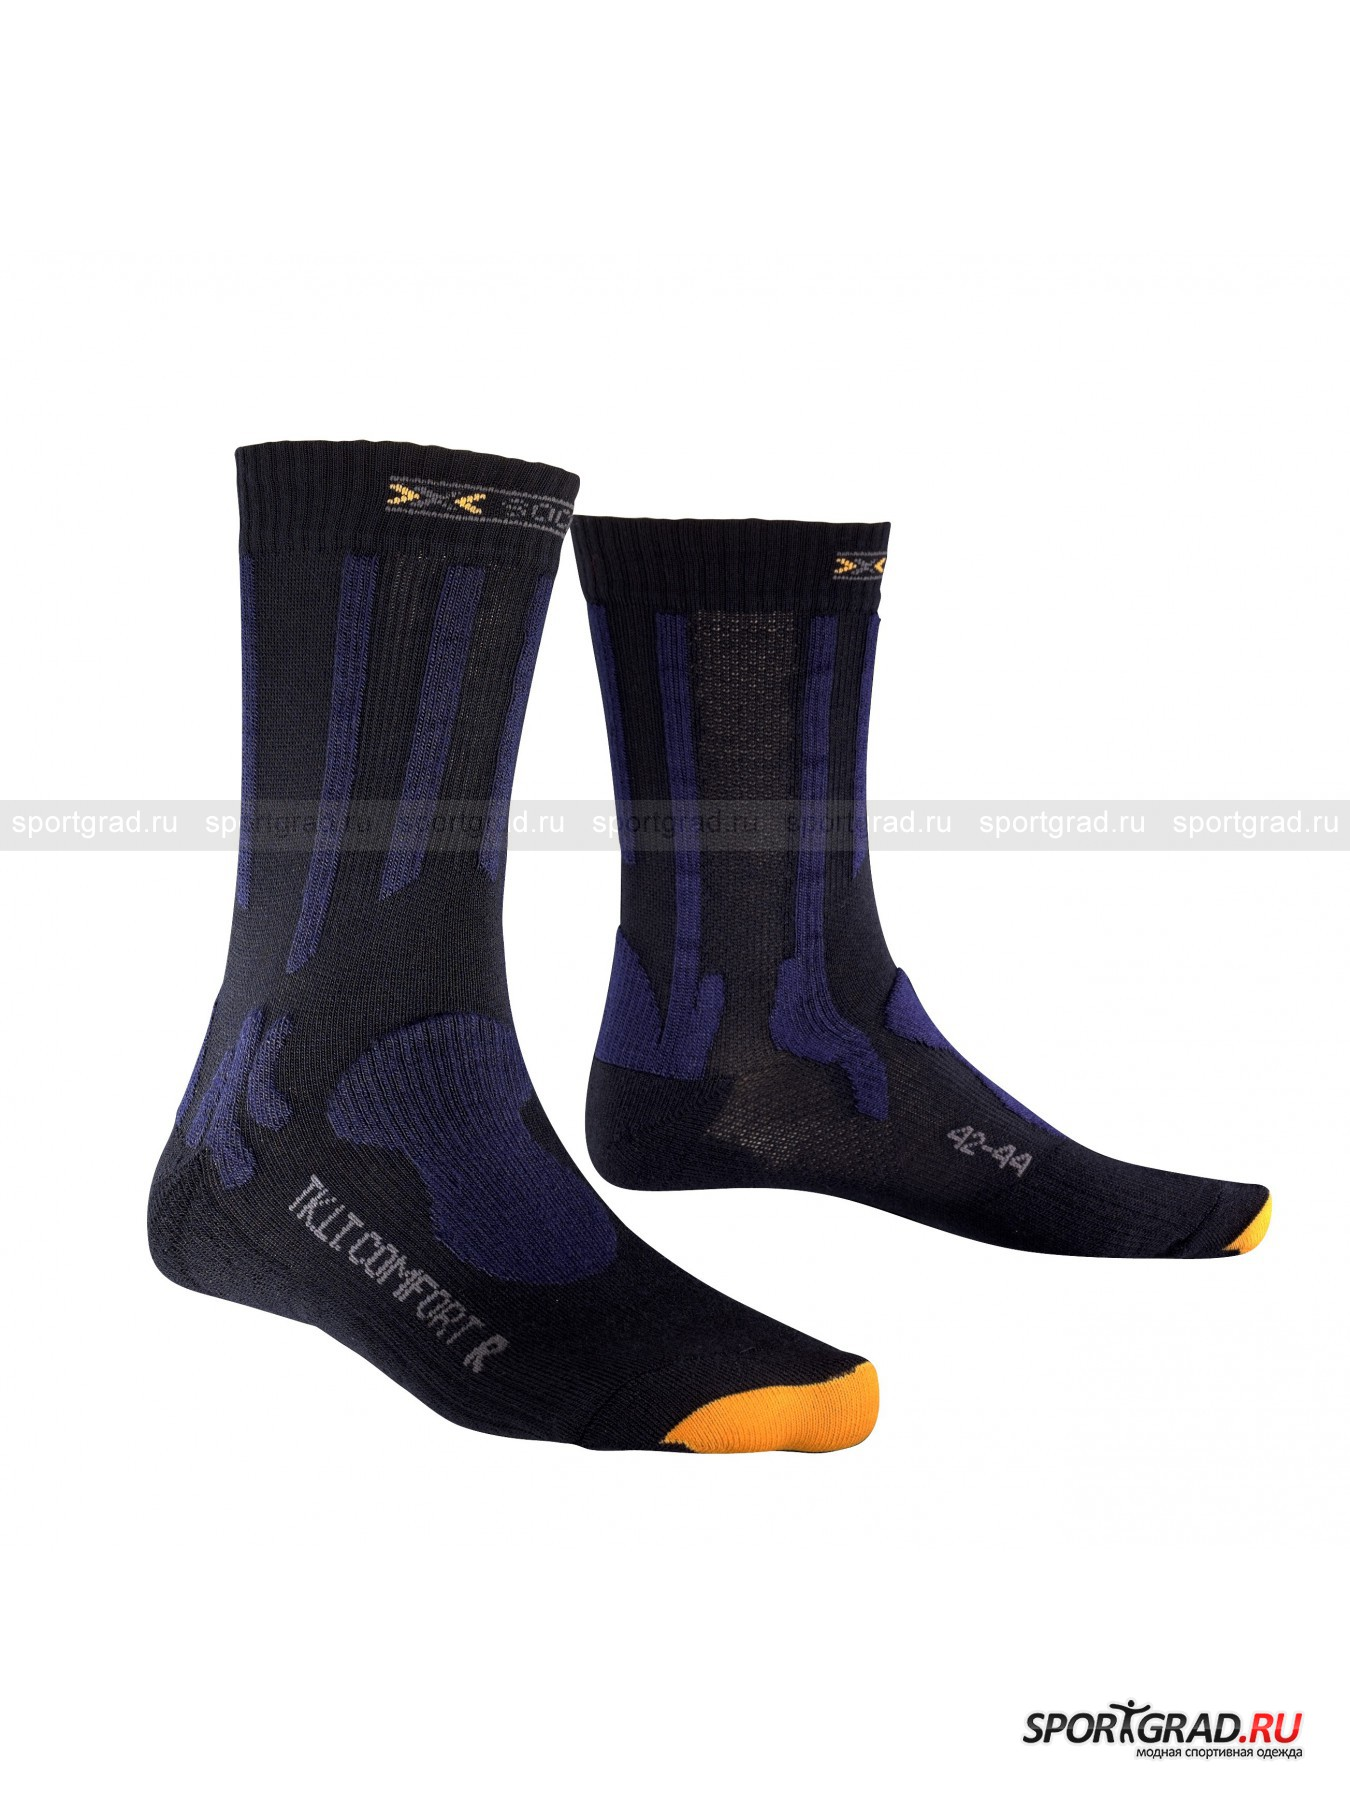 Носки Унисекс Trekking Light & Comfort  X-SOCKS